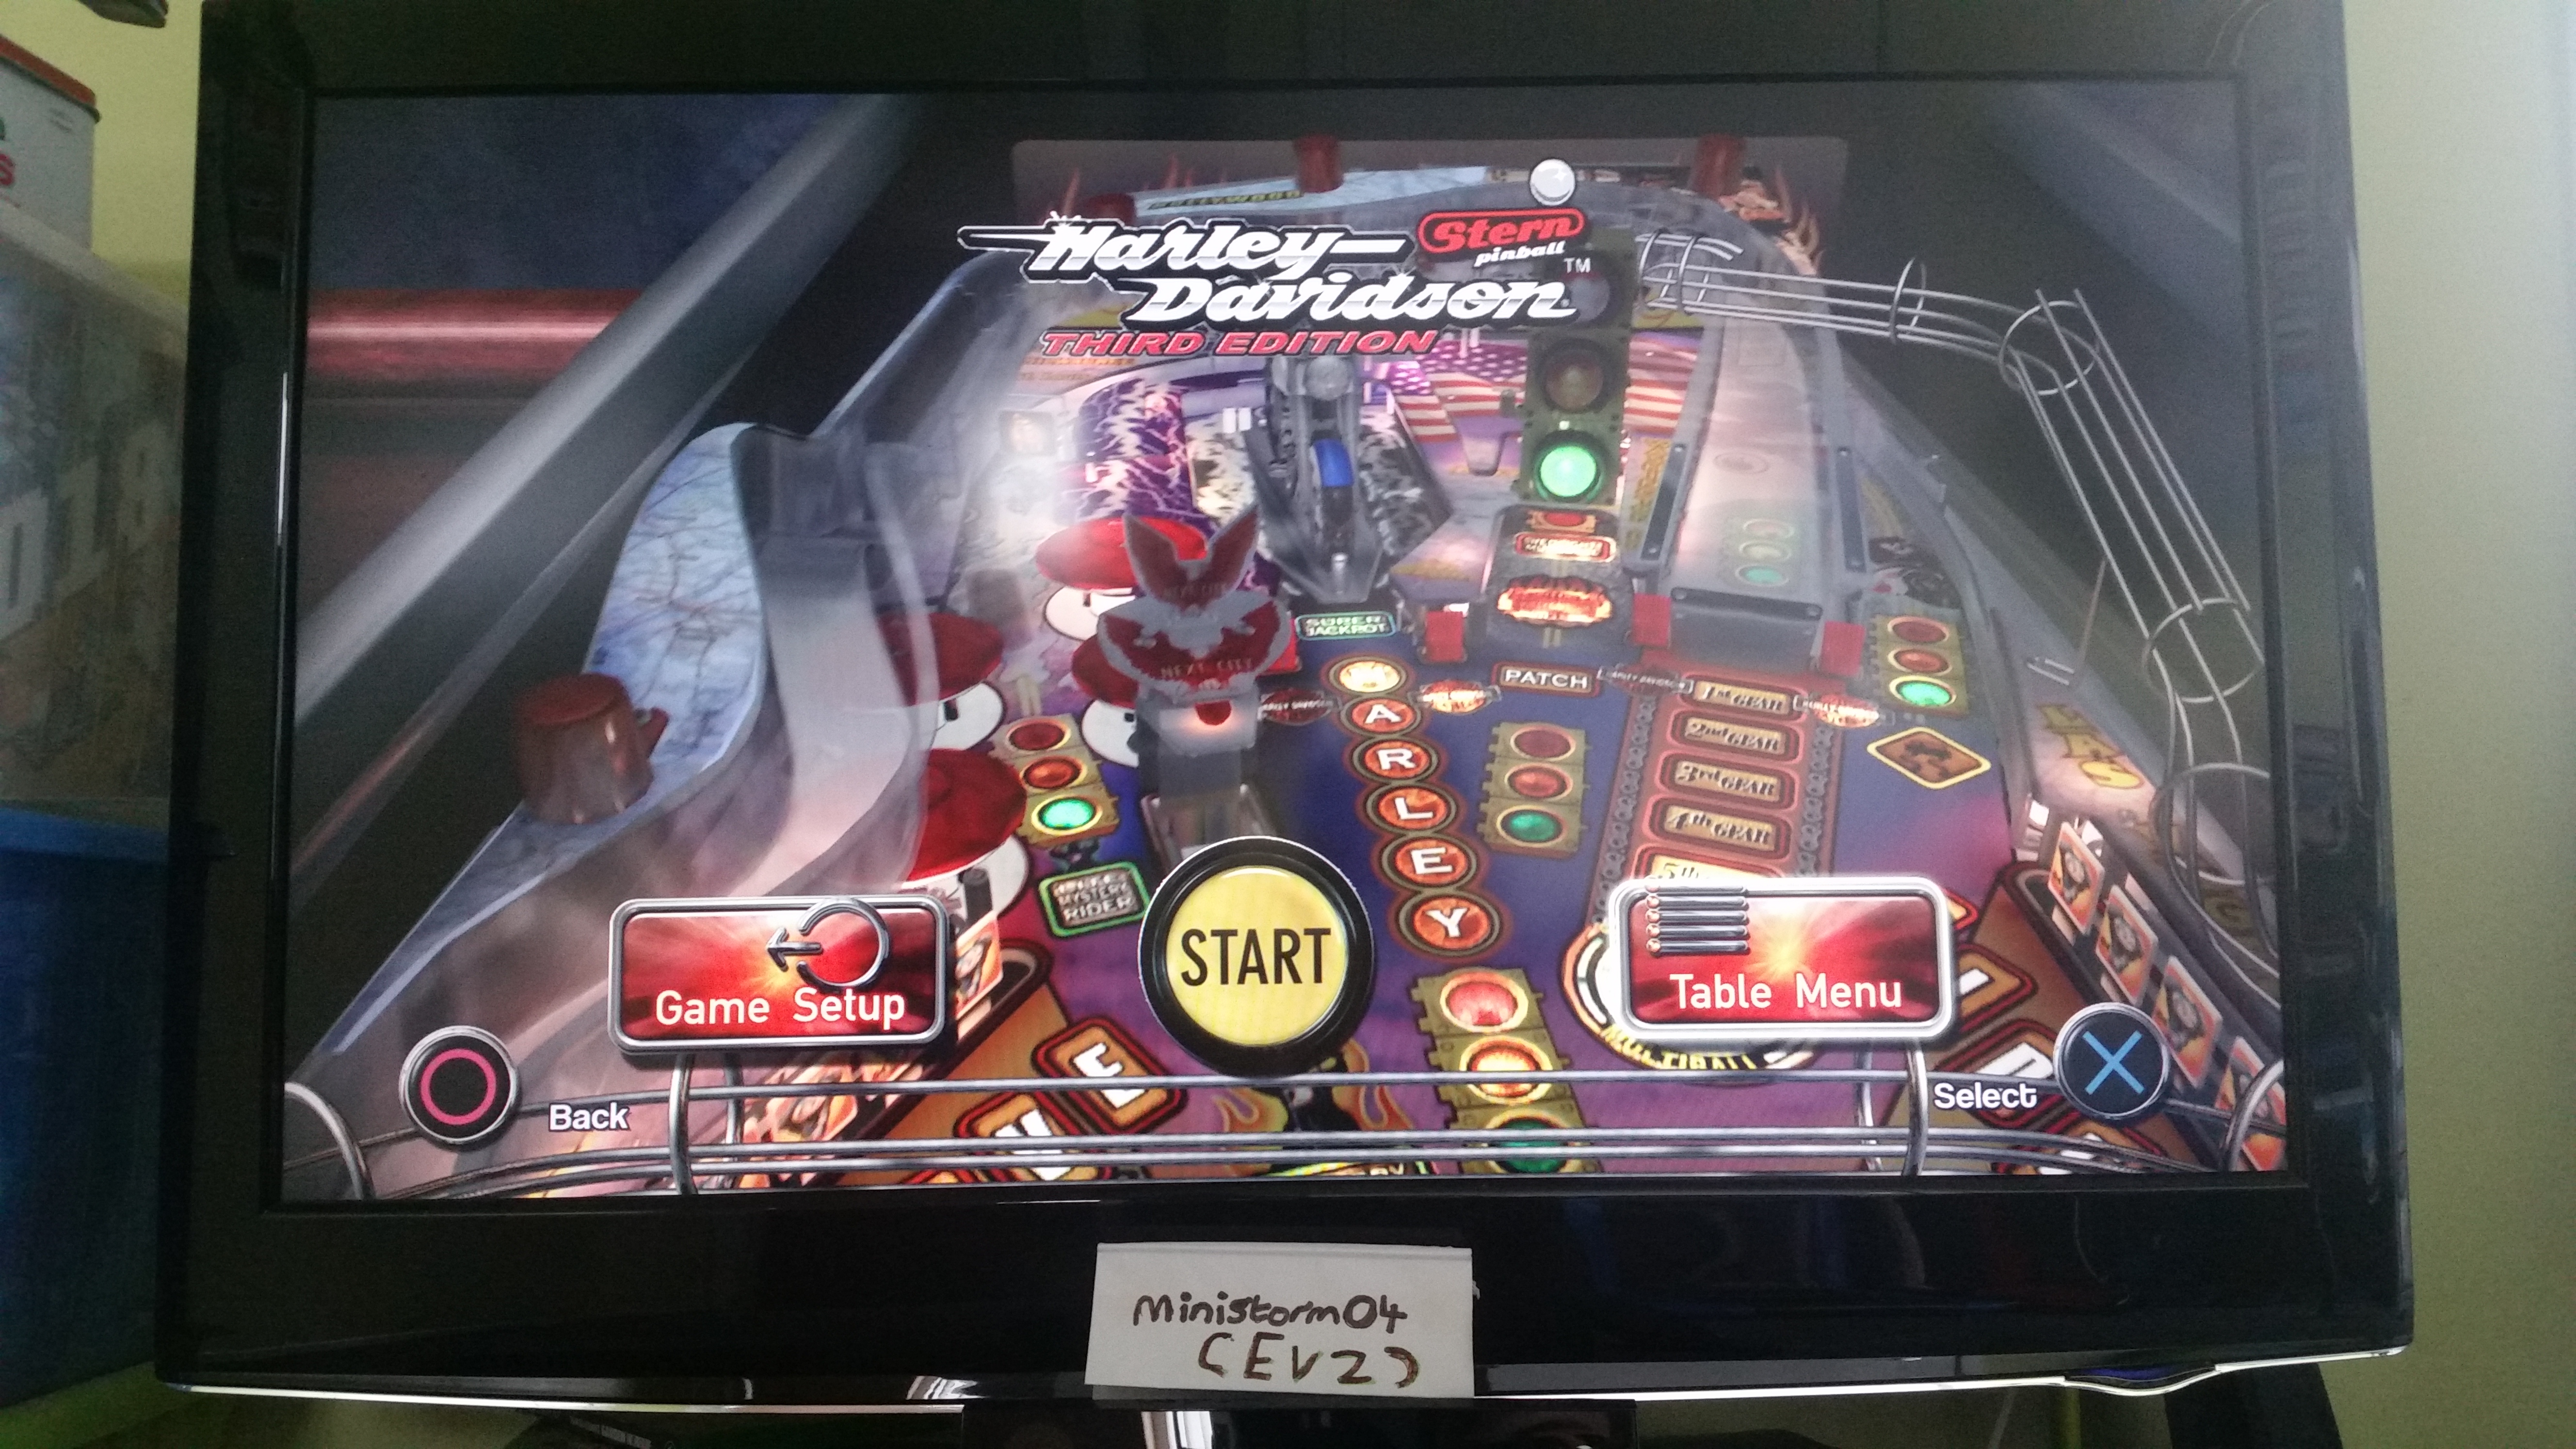 ministorm04: Pinball Arcade: Harley-Davidson (Playstation 4) 192,847,670 points on 2019-06-03 12:24:33